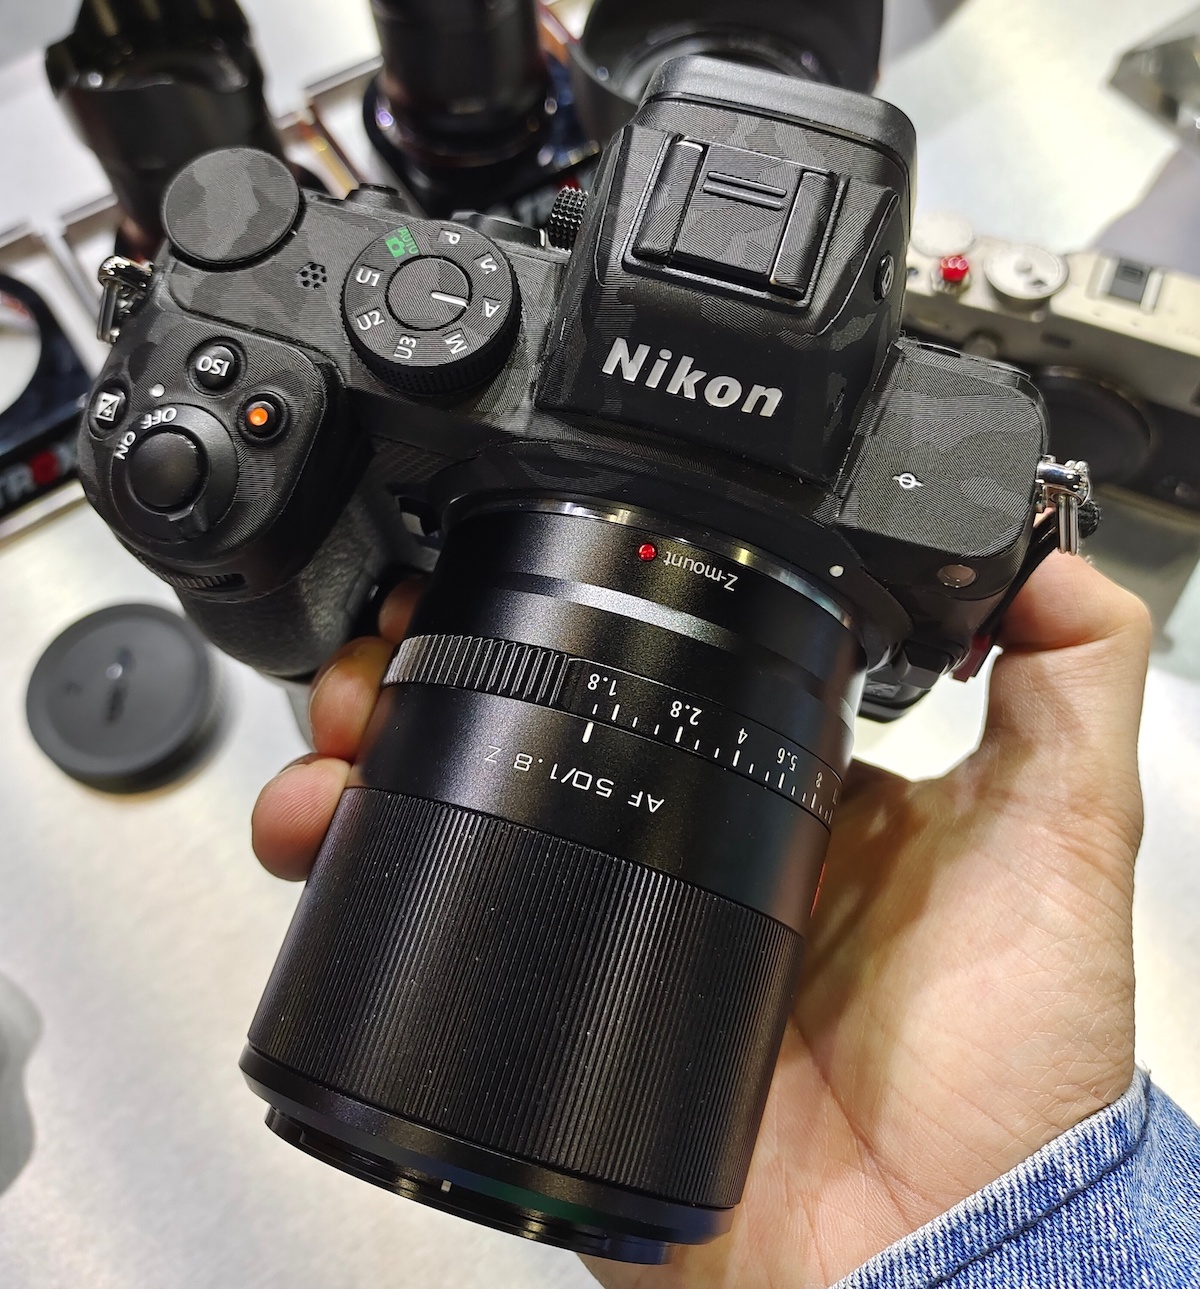 Объектив Viltrox AF 50mm f/1.8 Z с камерой Nikon